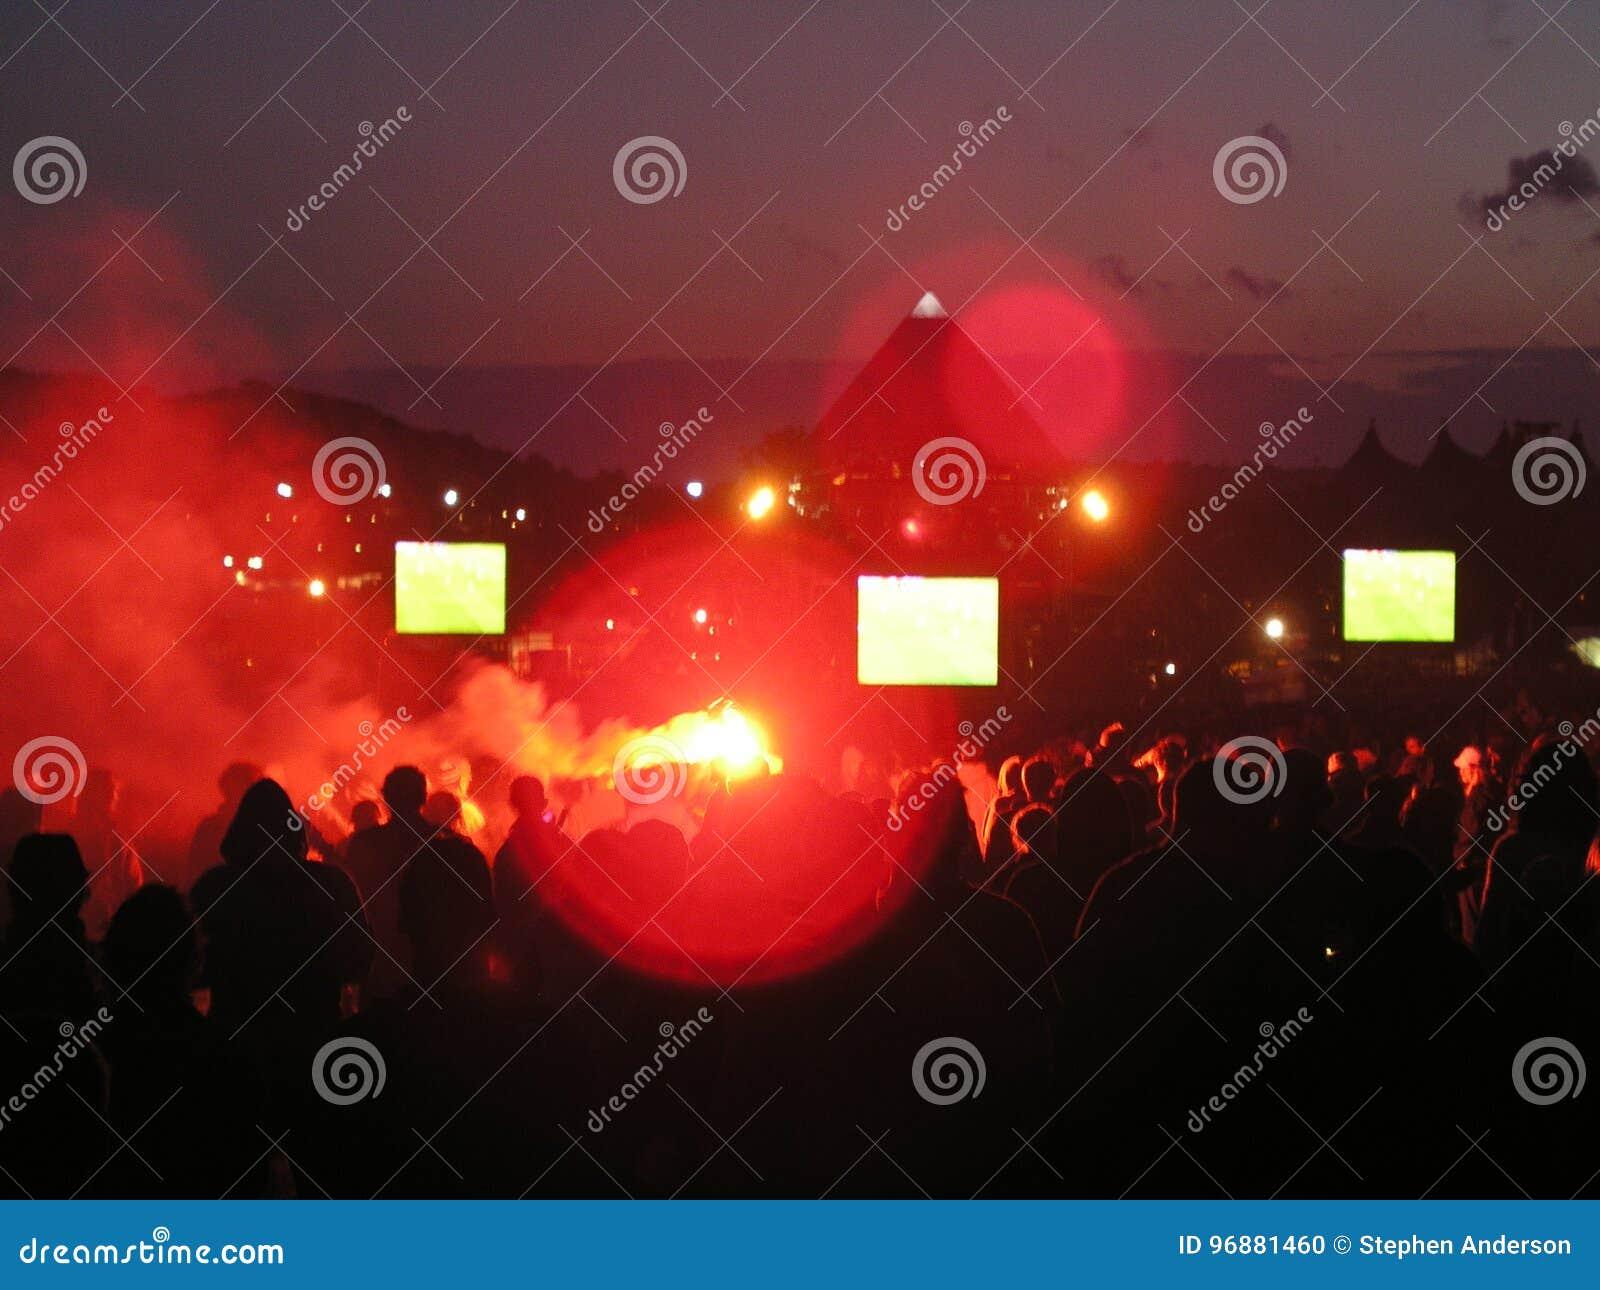 Glastonbury Festival Main Stage 2004 Stock Photo - Image of